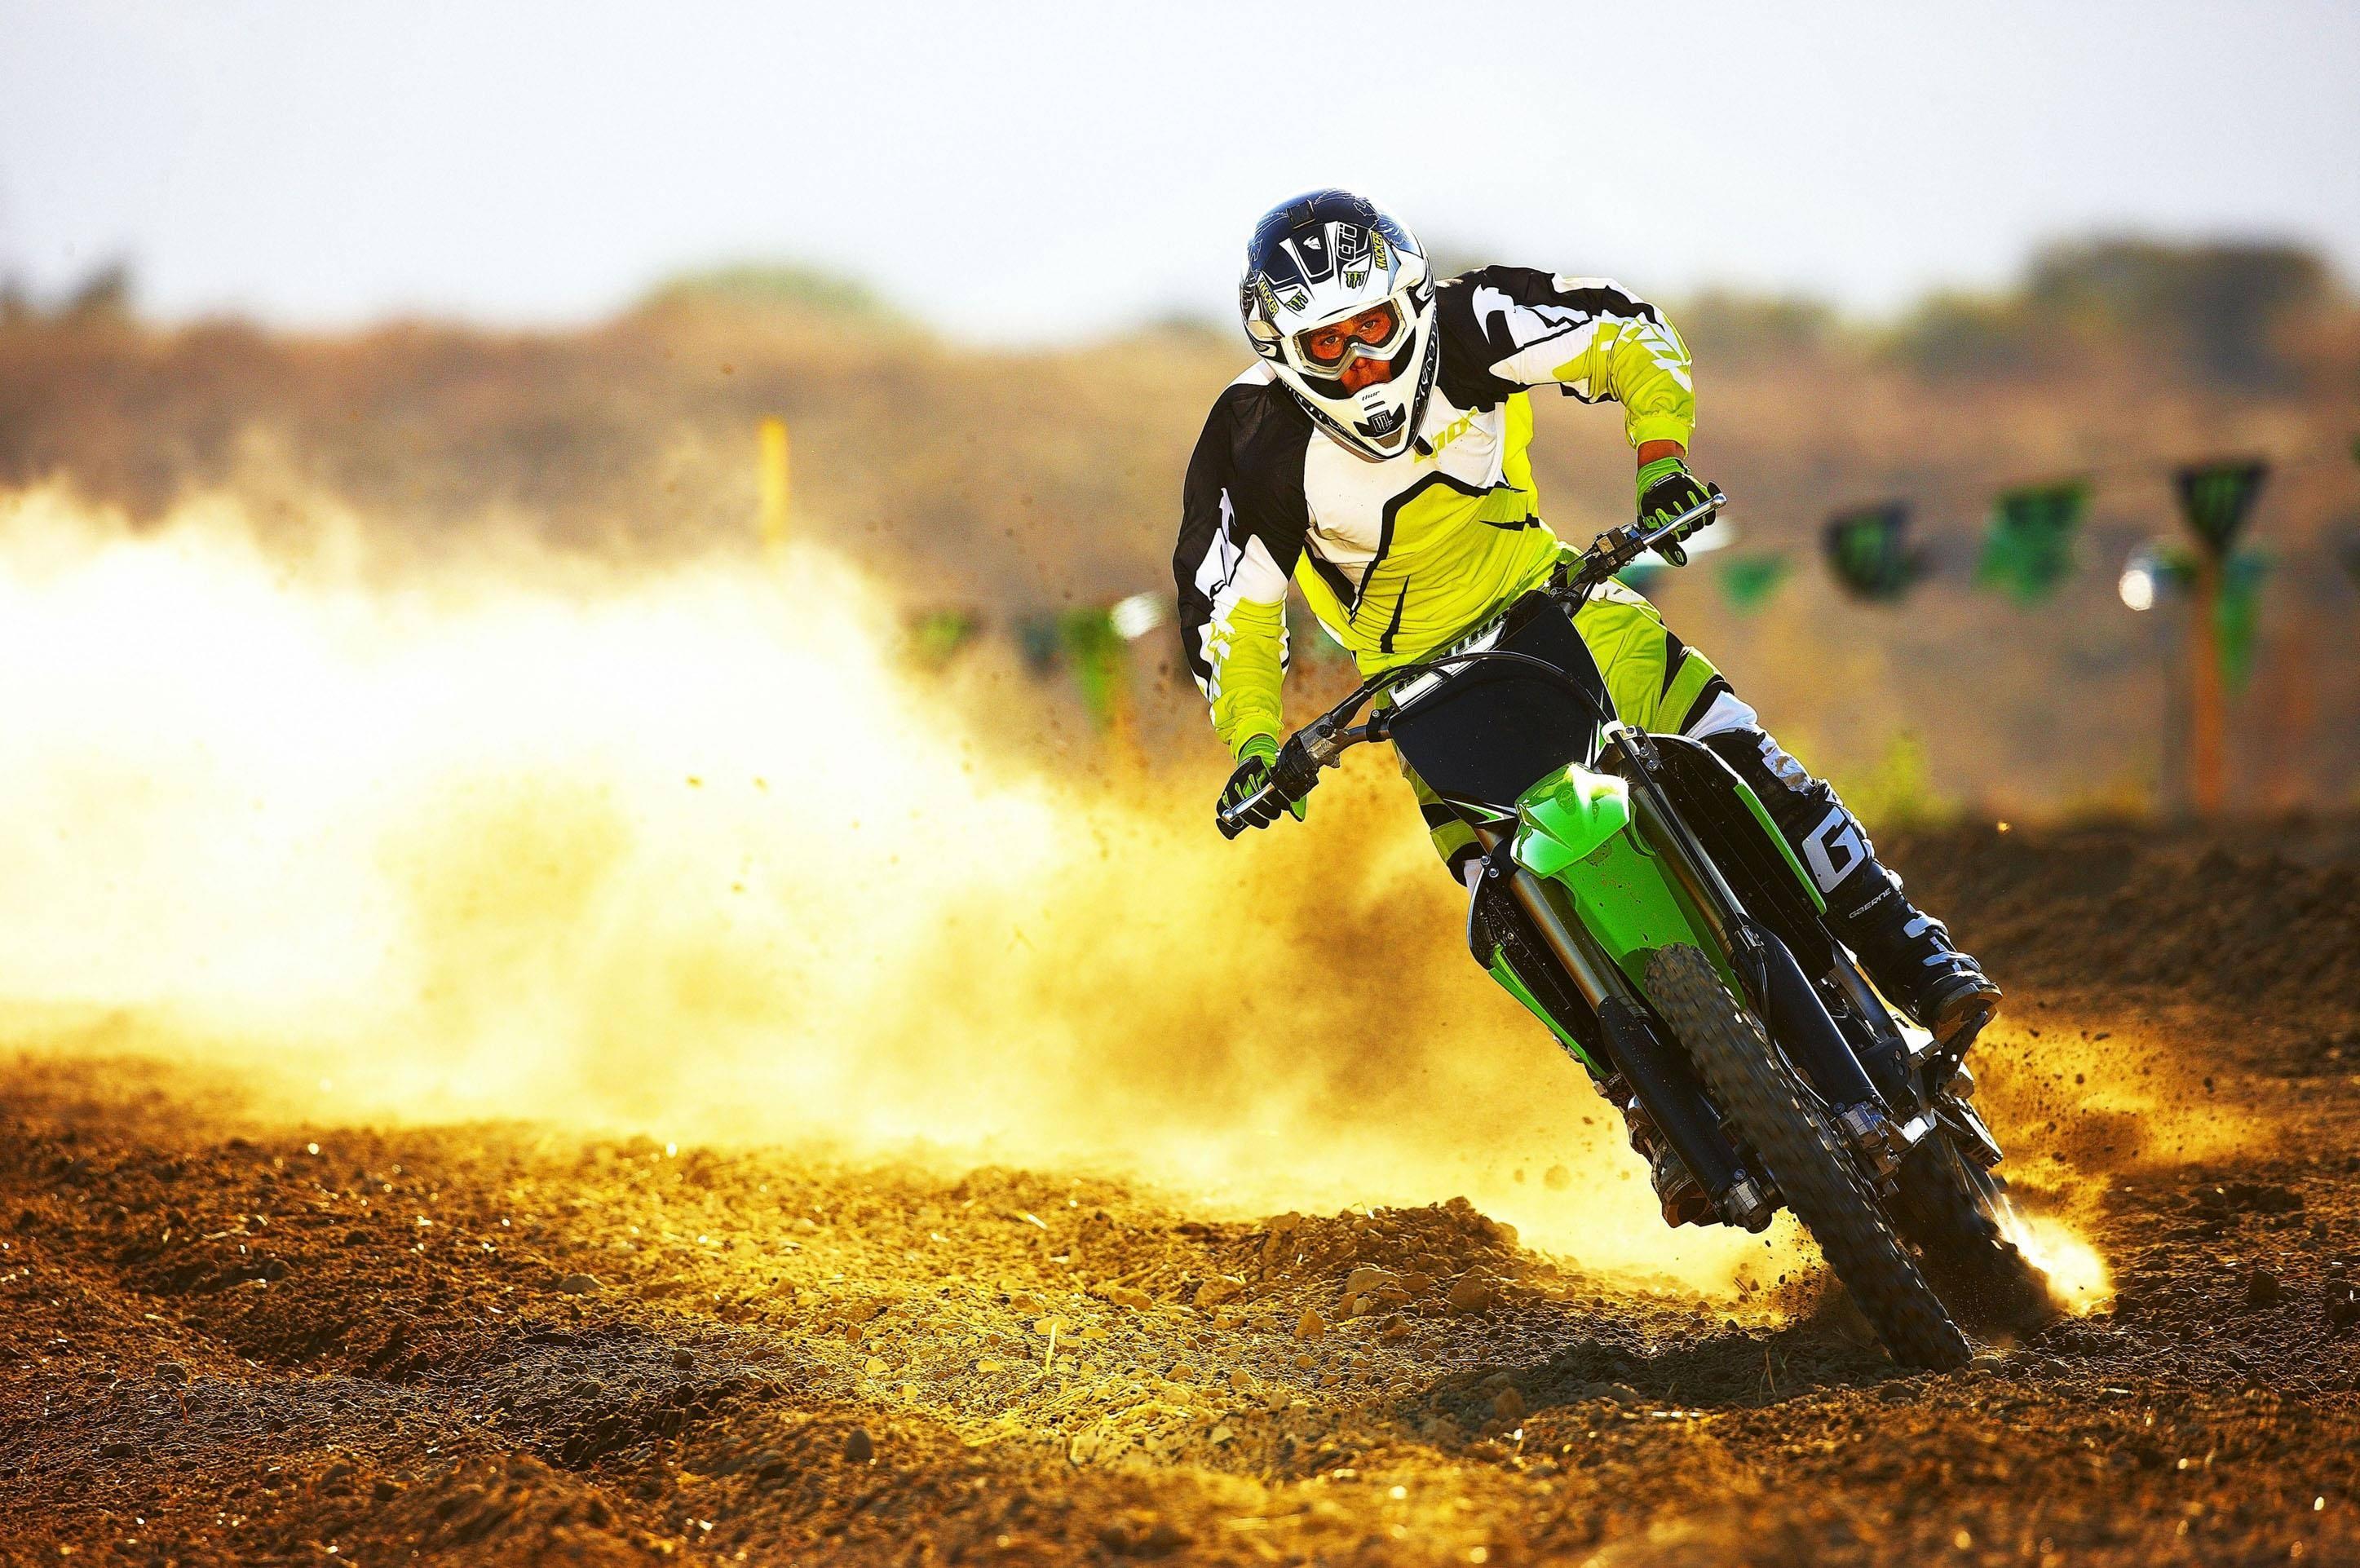 Image For Freestyle Motocross Wallpaper HD Resolution Usxv3